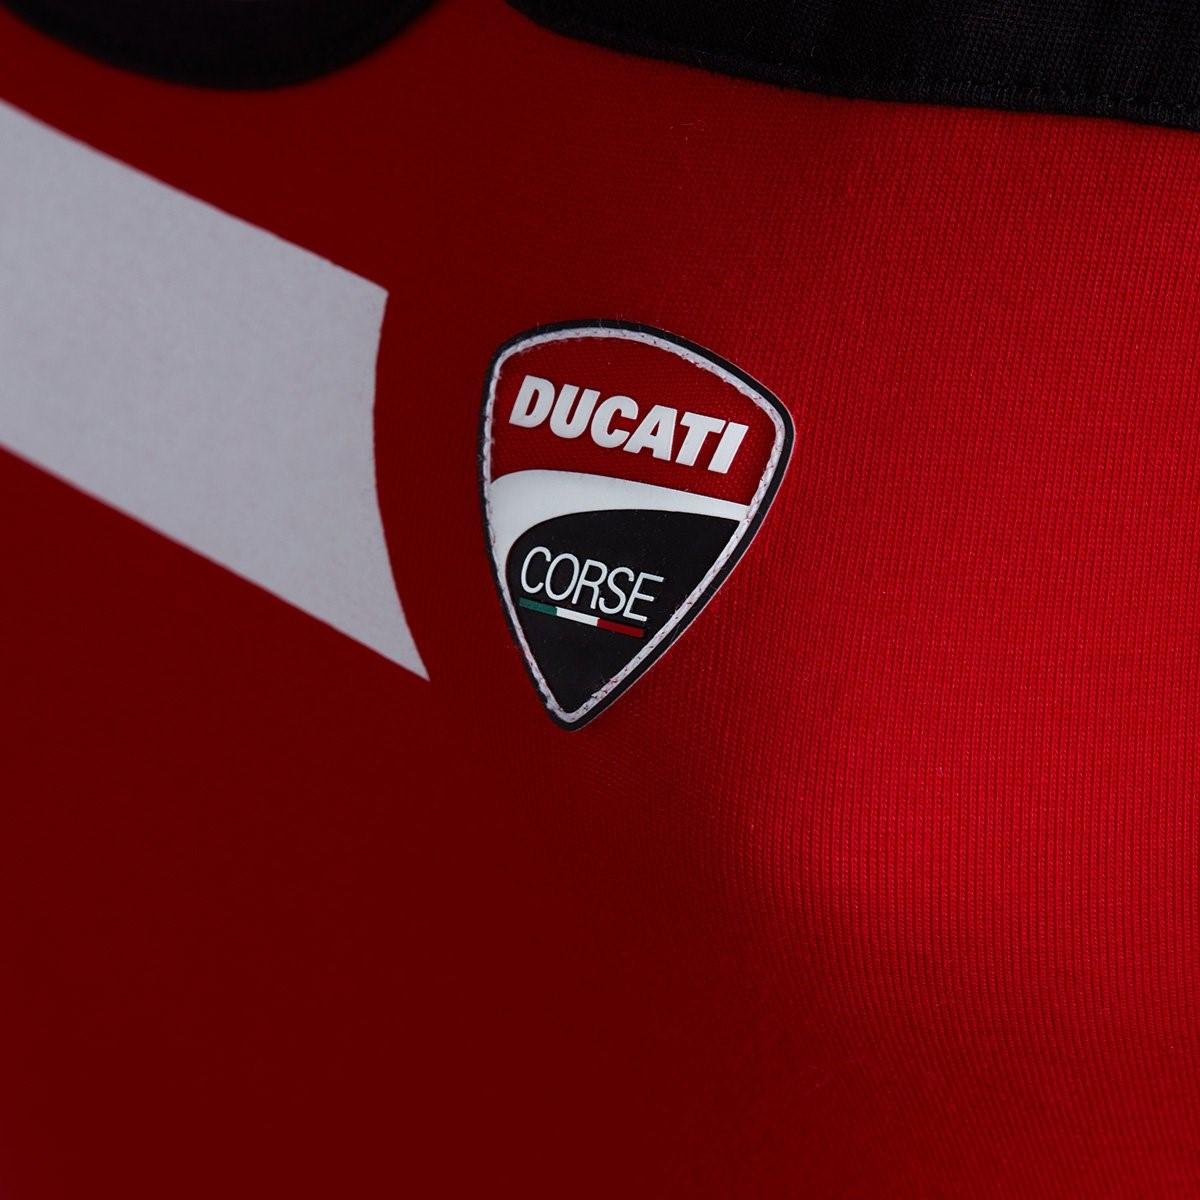 【DUCATI performance】Ducati Corse Speed 女用背心 - 「Webike-摩托百貨」